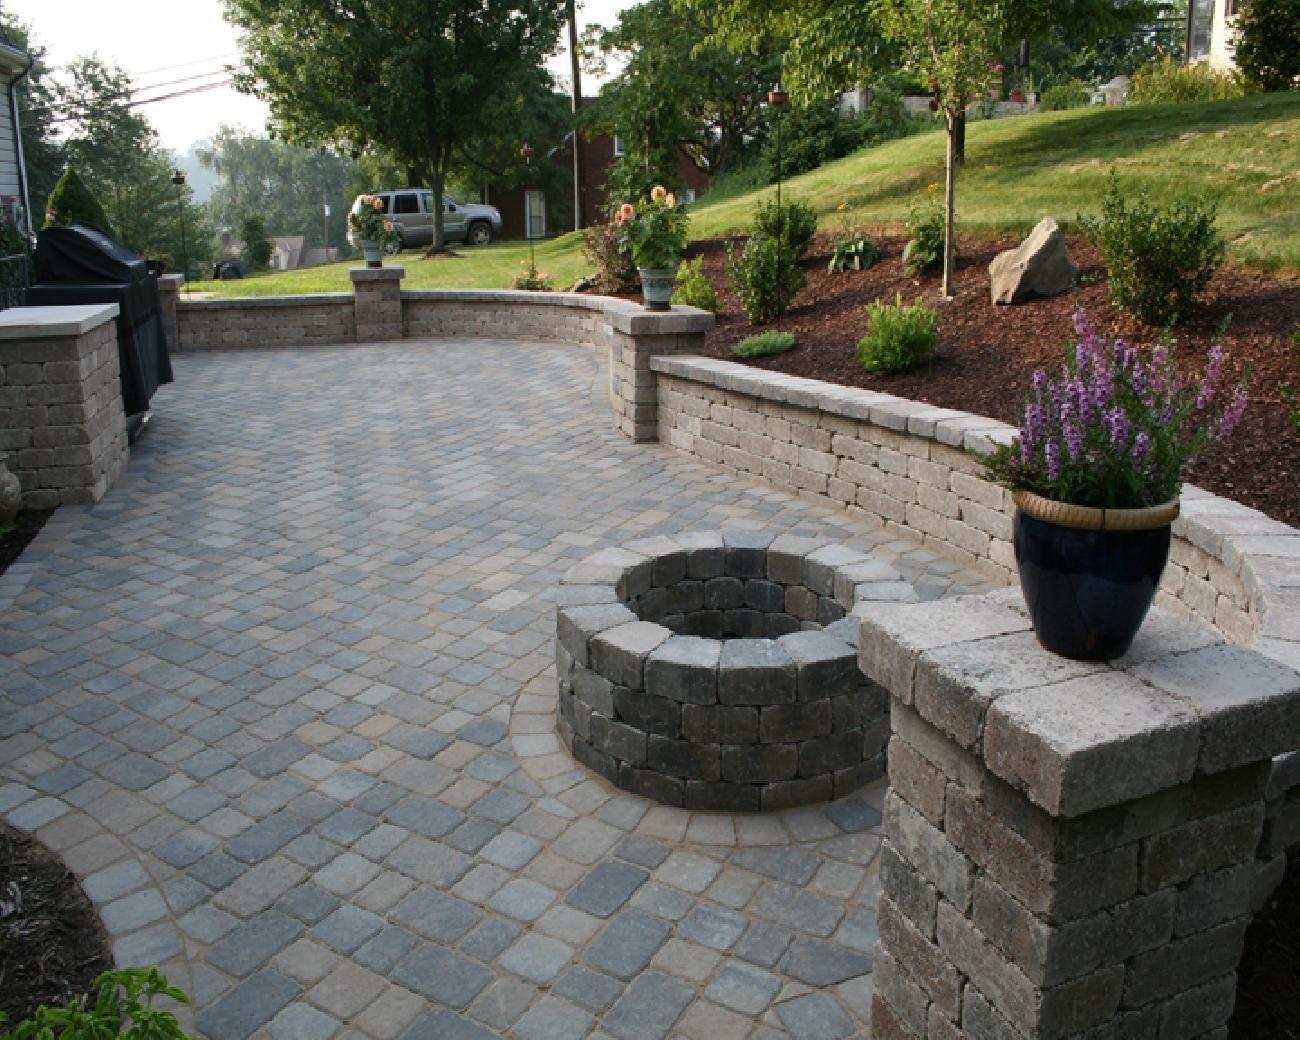 Exceptional Cement U0026 Concrete Interlocking Stone Pavers | Patios U0026 Driveways